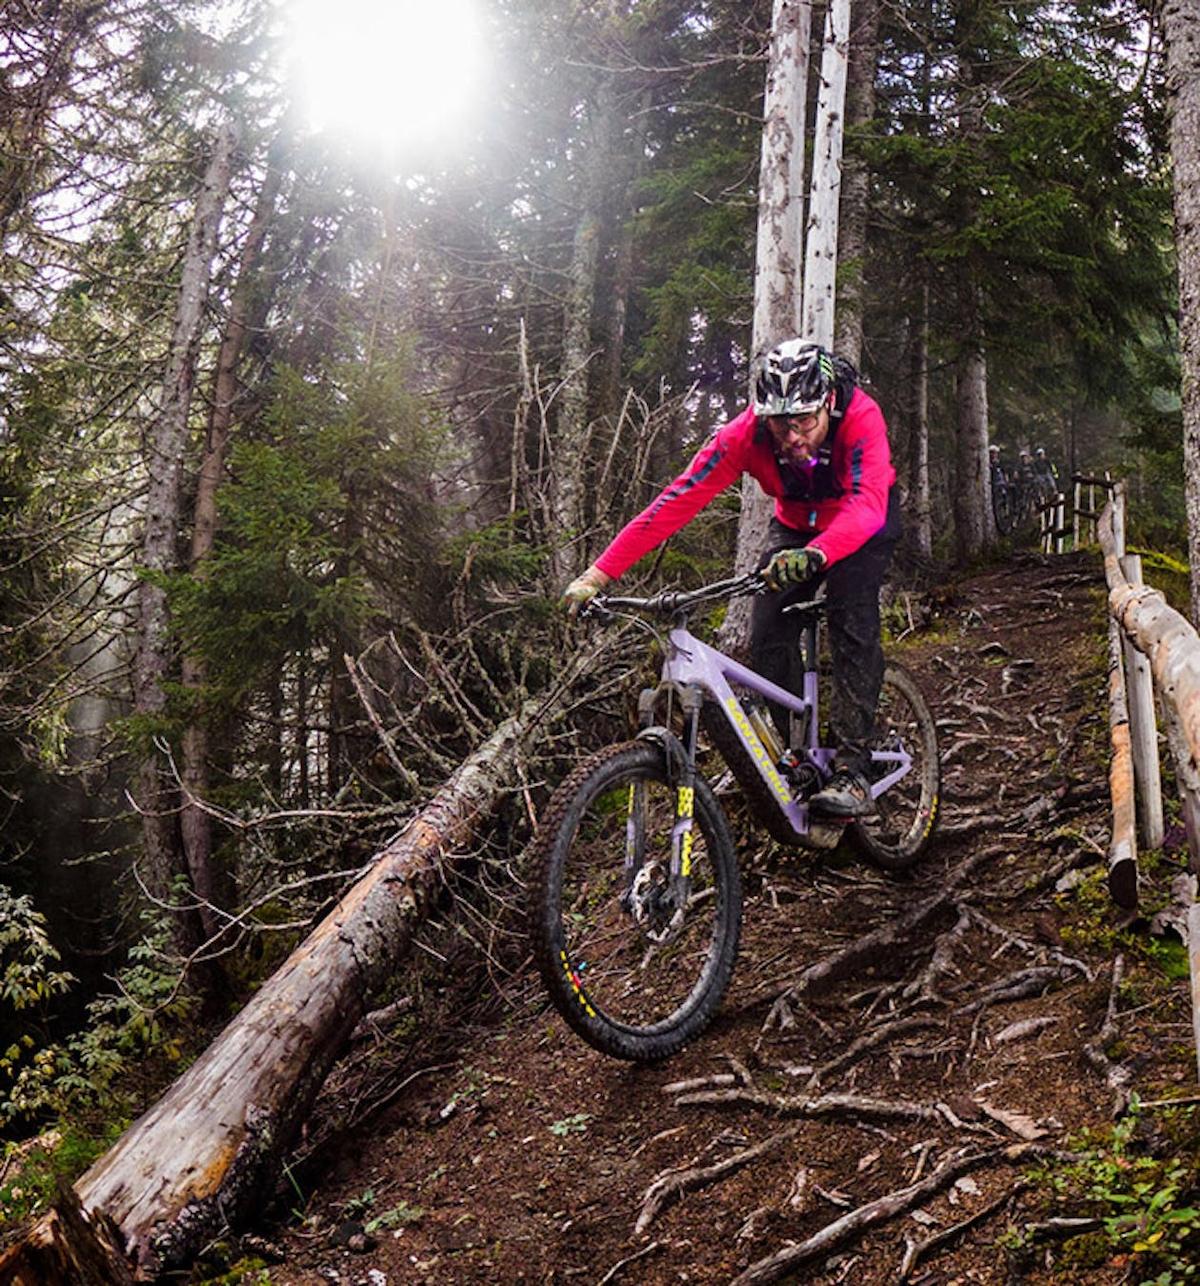 Max S. riding the Santa Cruz Bullit down a root-filled trail